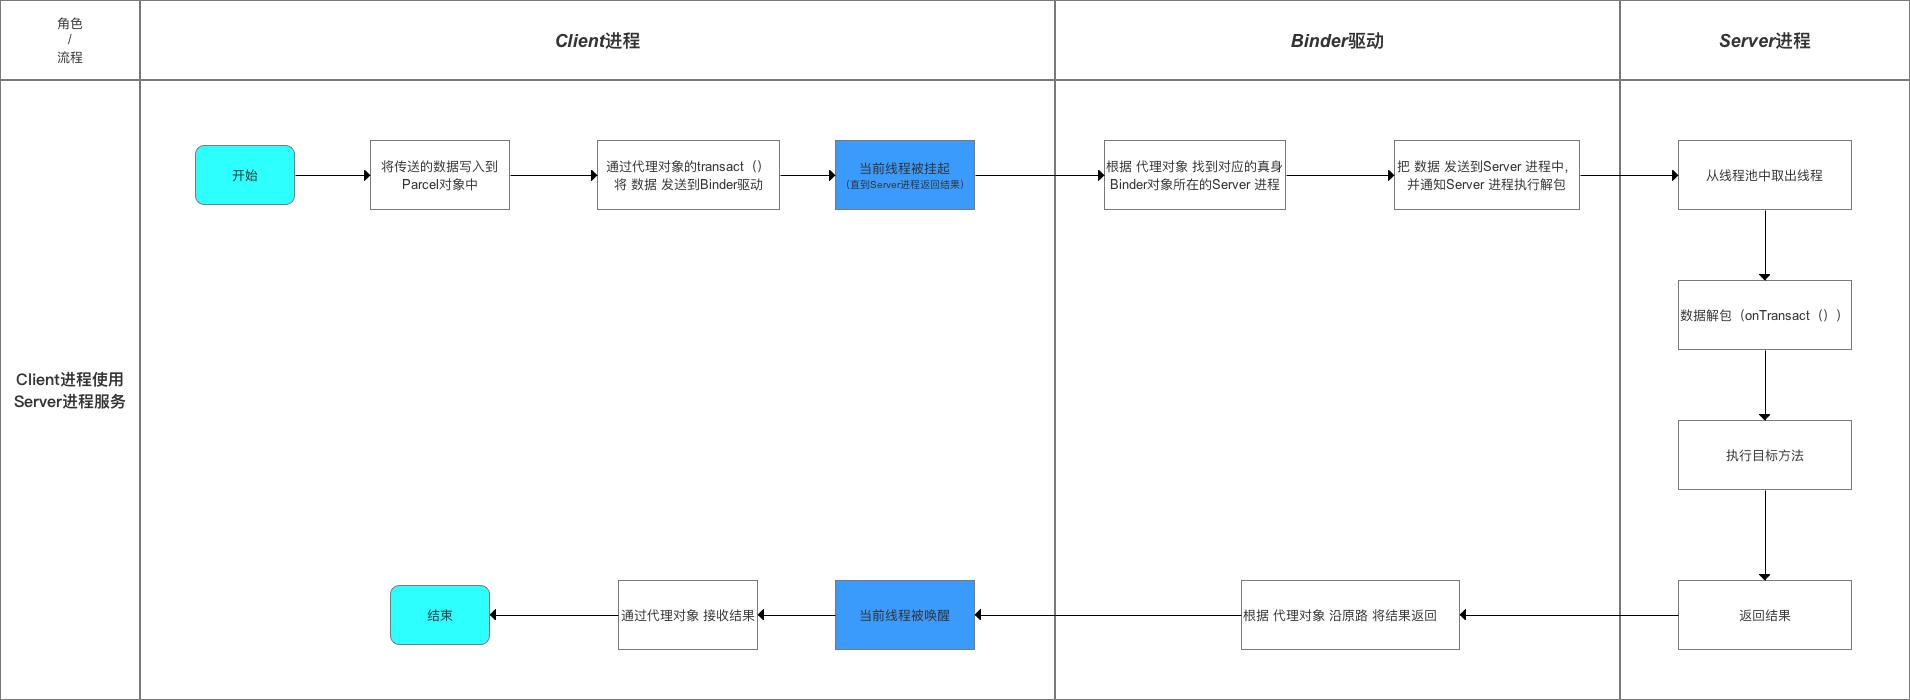 Binder机制流程图